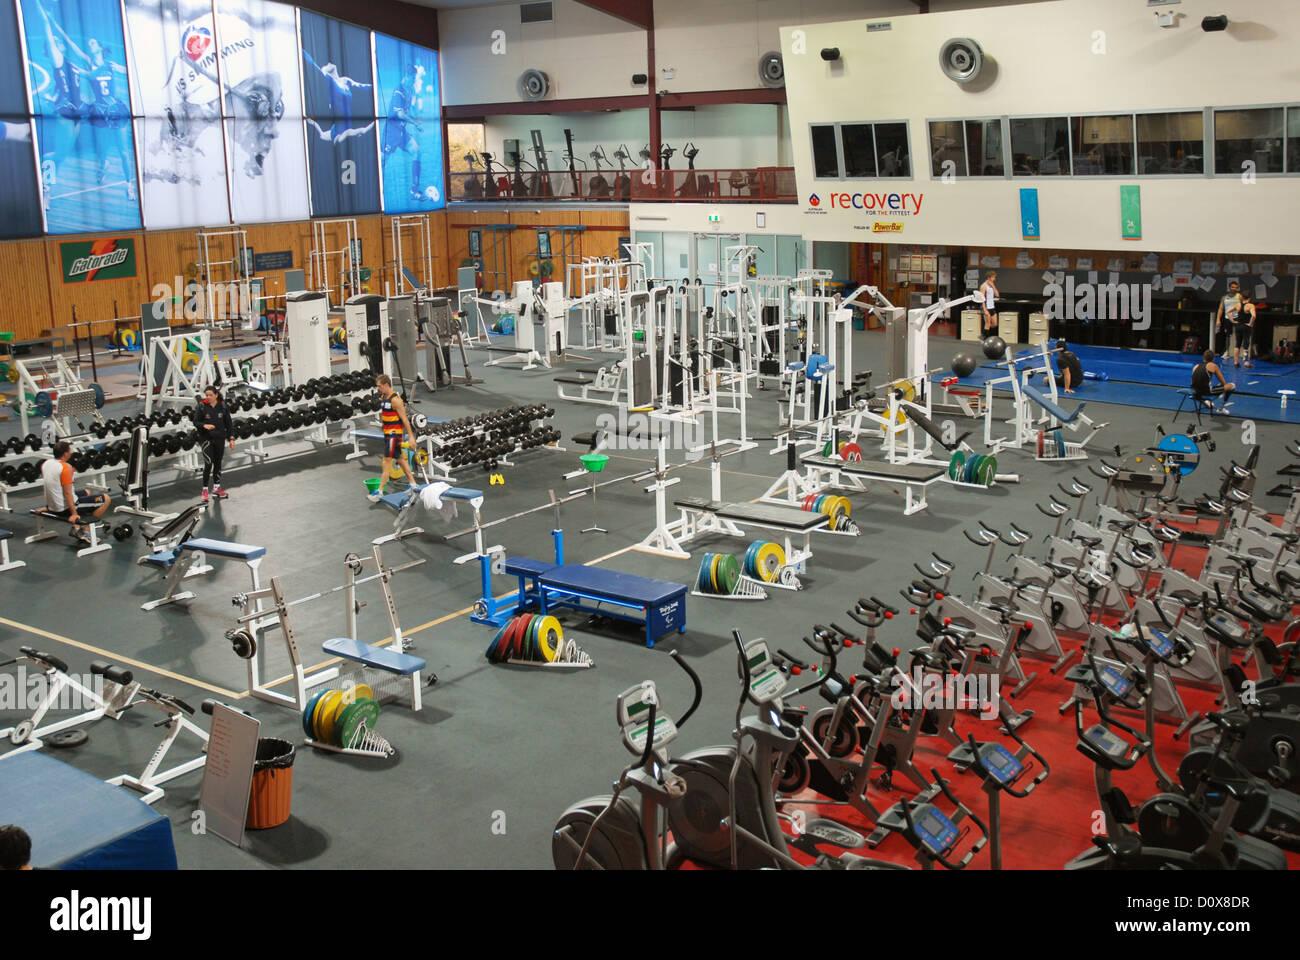 Fitness-Studio, das Australian Institute of Sport (AIS), Australien,  Canberra, ACT Stockfotografie - Alamy